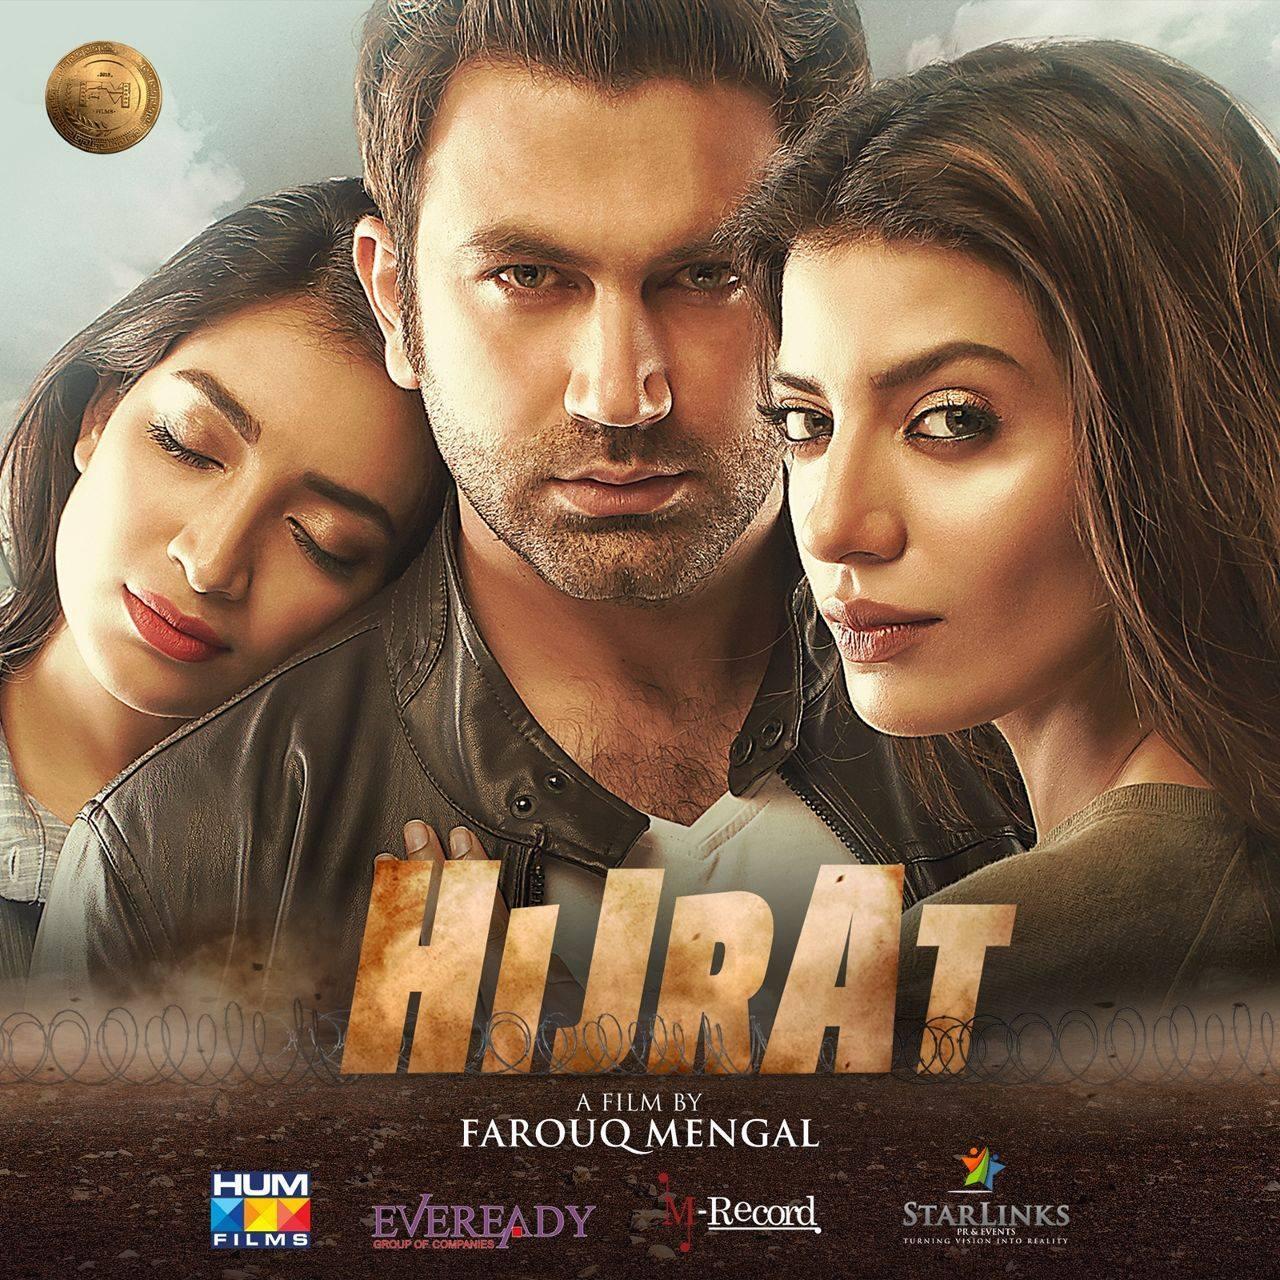 Hijrat 2016 Pakistani Full Movie Download Online Free